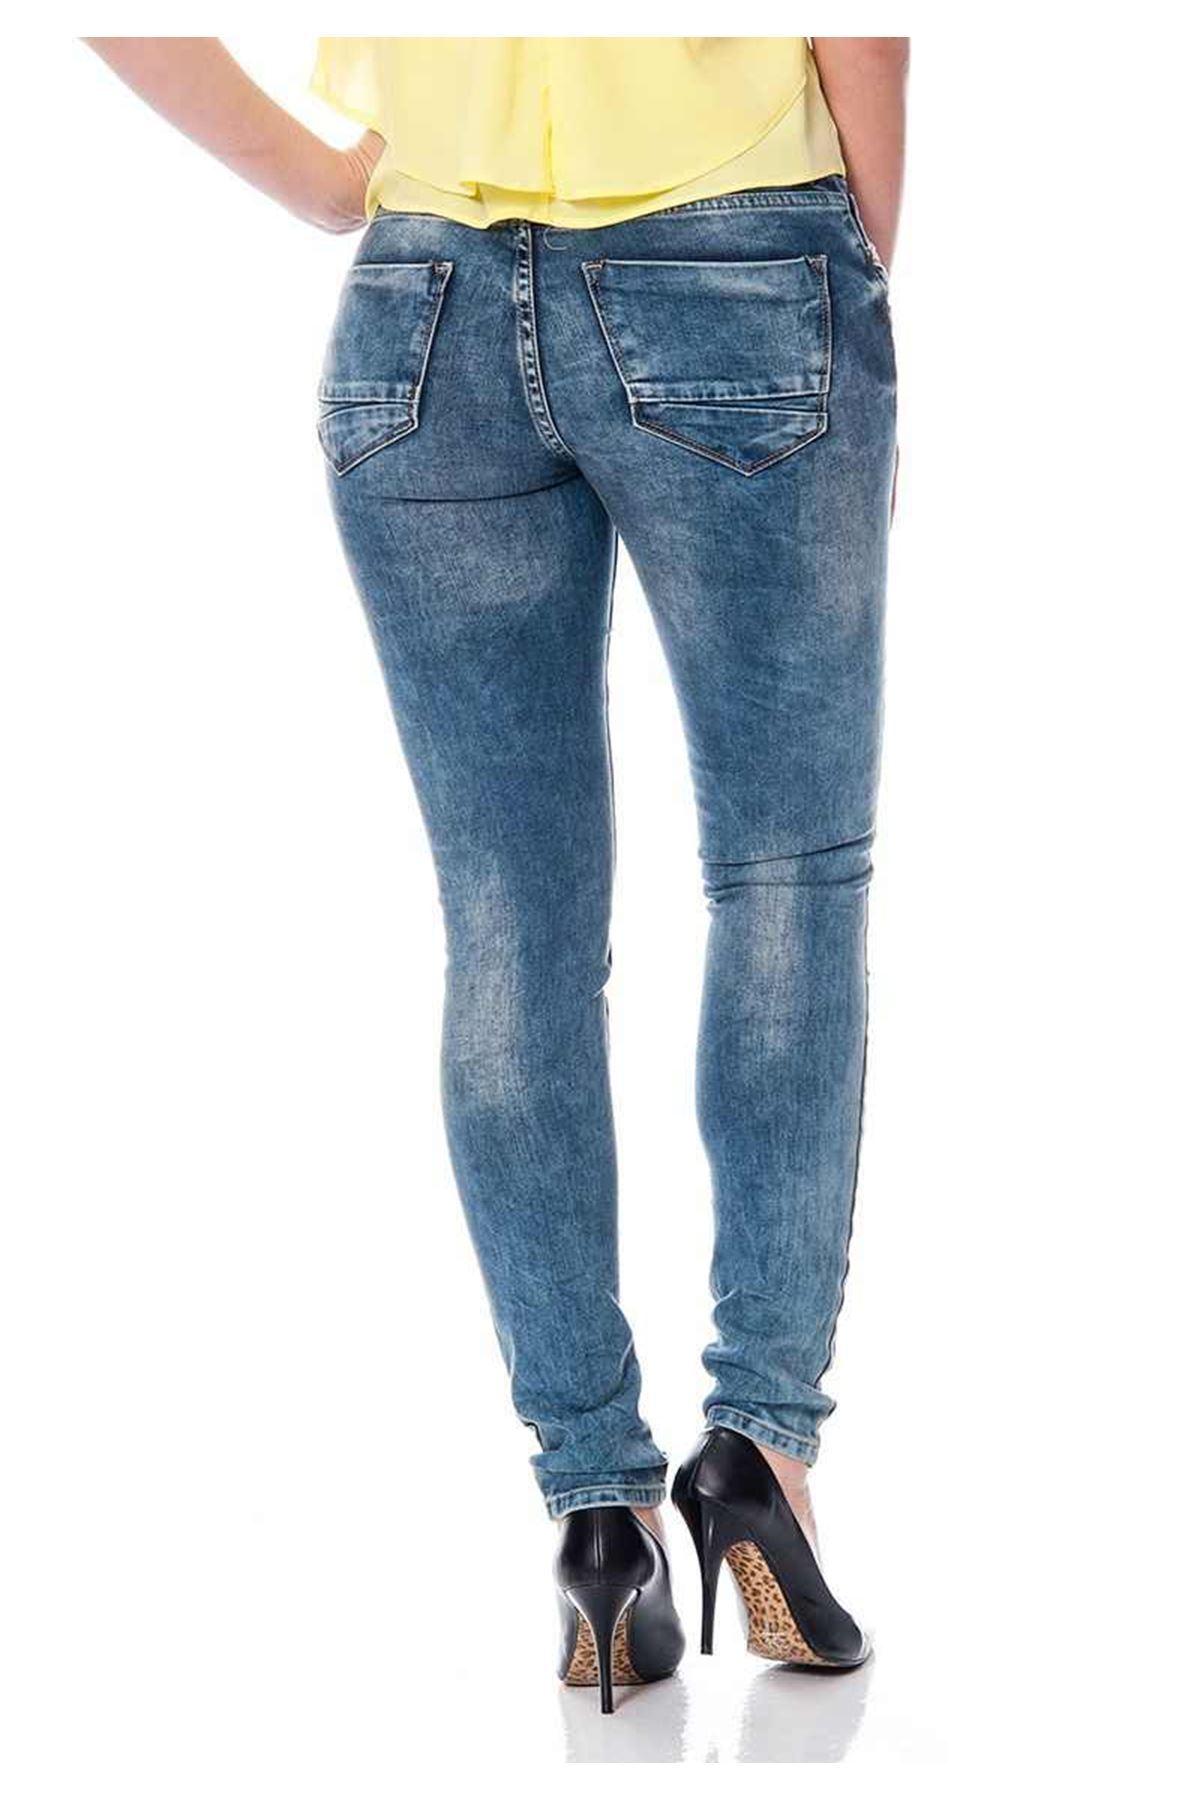 Lacivert Taşlanmış Yırtık Kot Pantolon 5A-110577